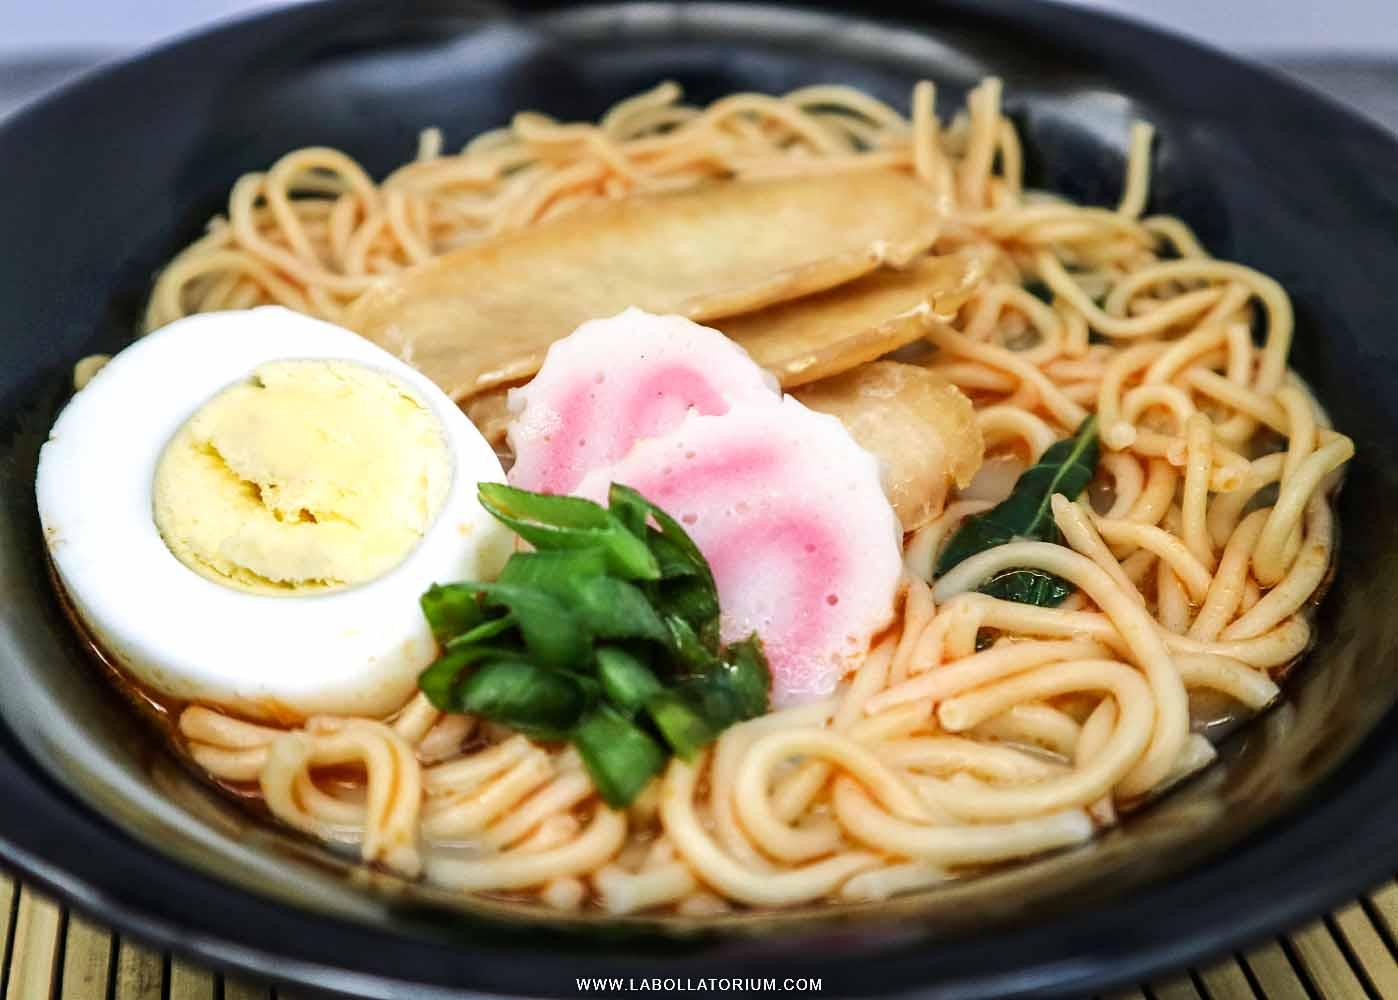 5 Cara Untuk Upgrade Mie Ramen Instan Nissin Mikuya, Oishii!